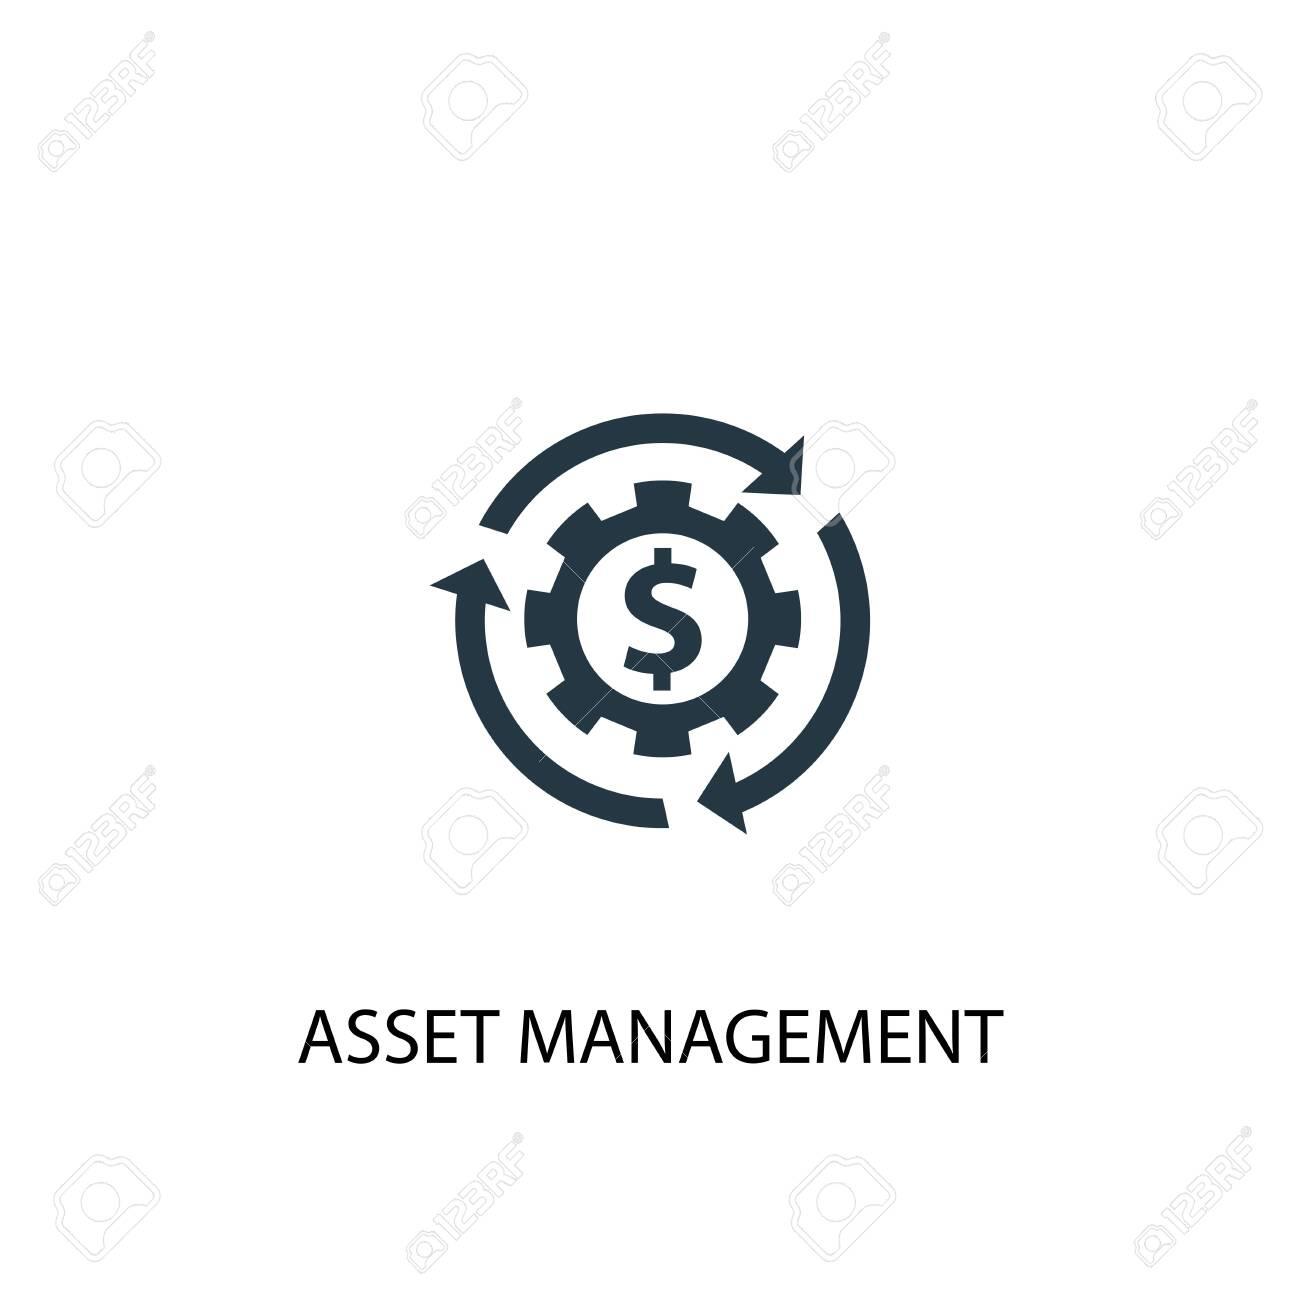 asset management icon. Simple element illustration. asset management concept symbol design. Can be used for web - 133749164